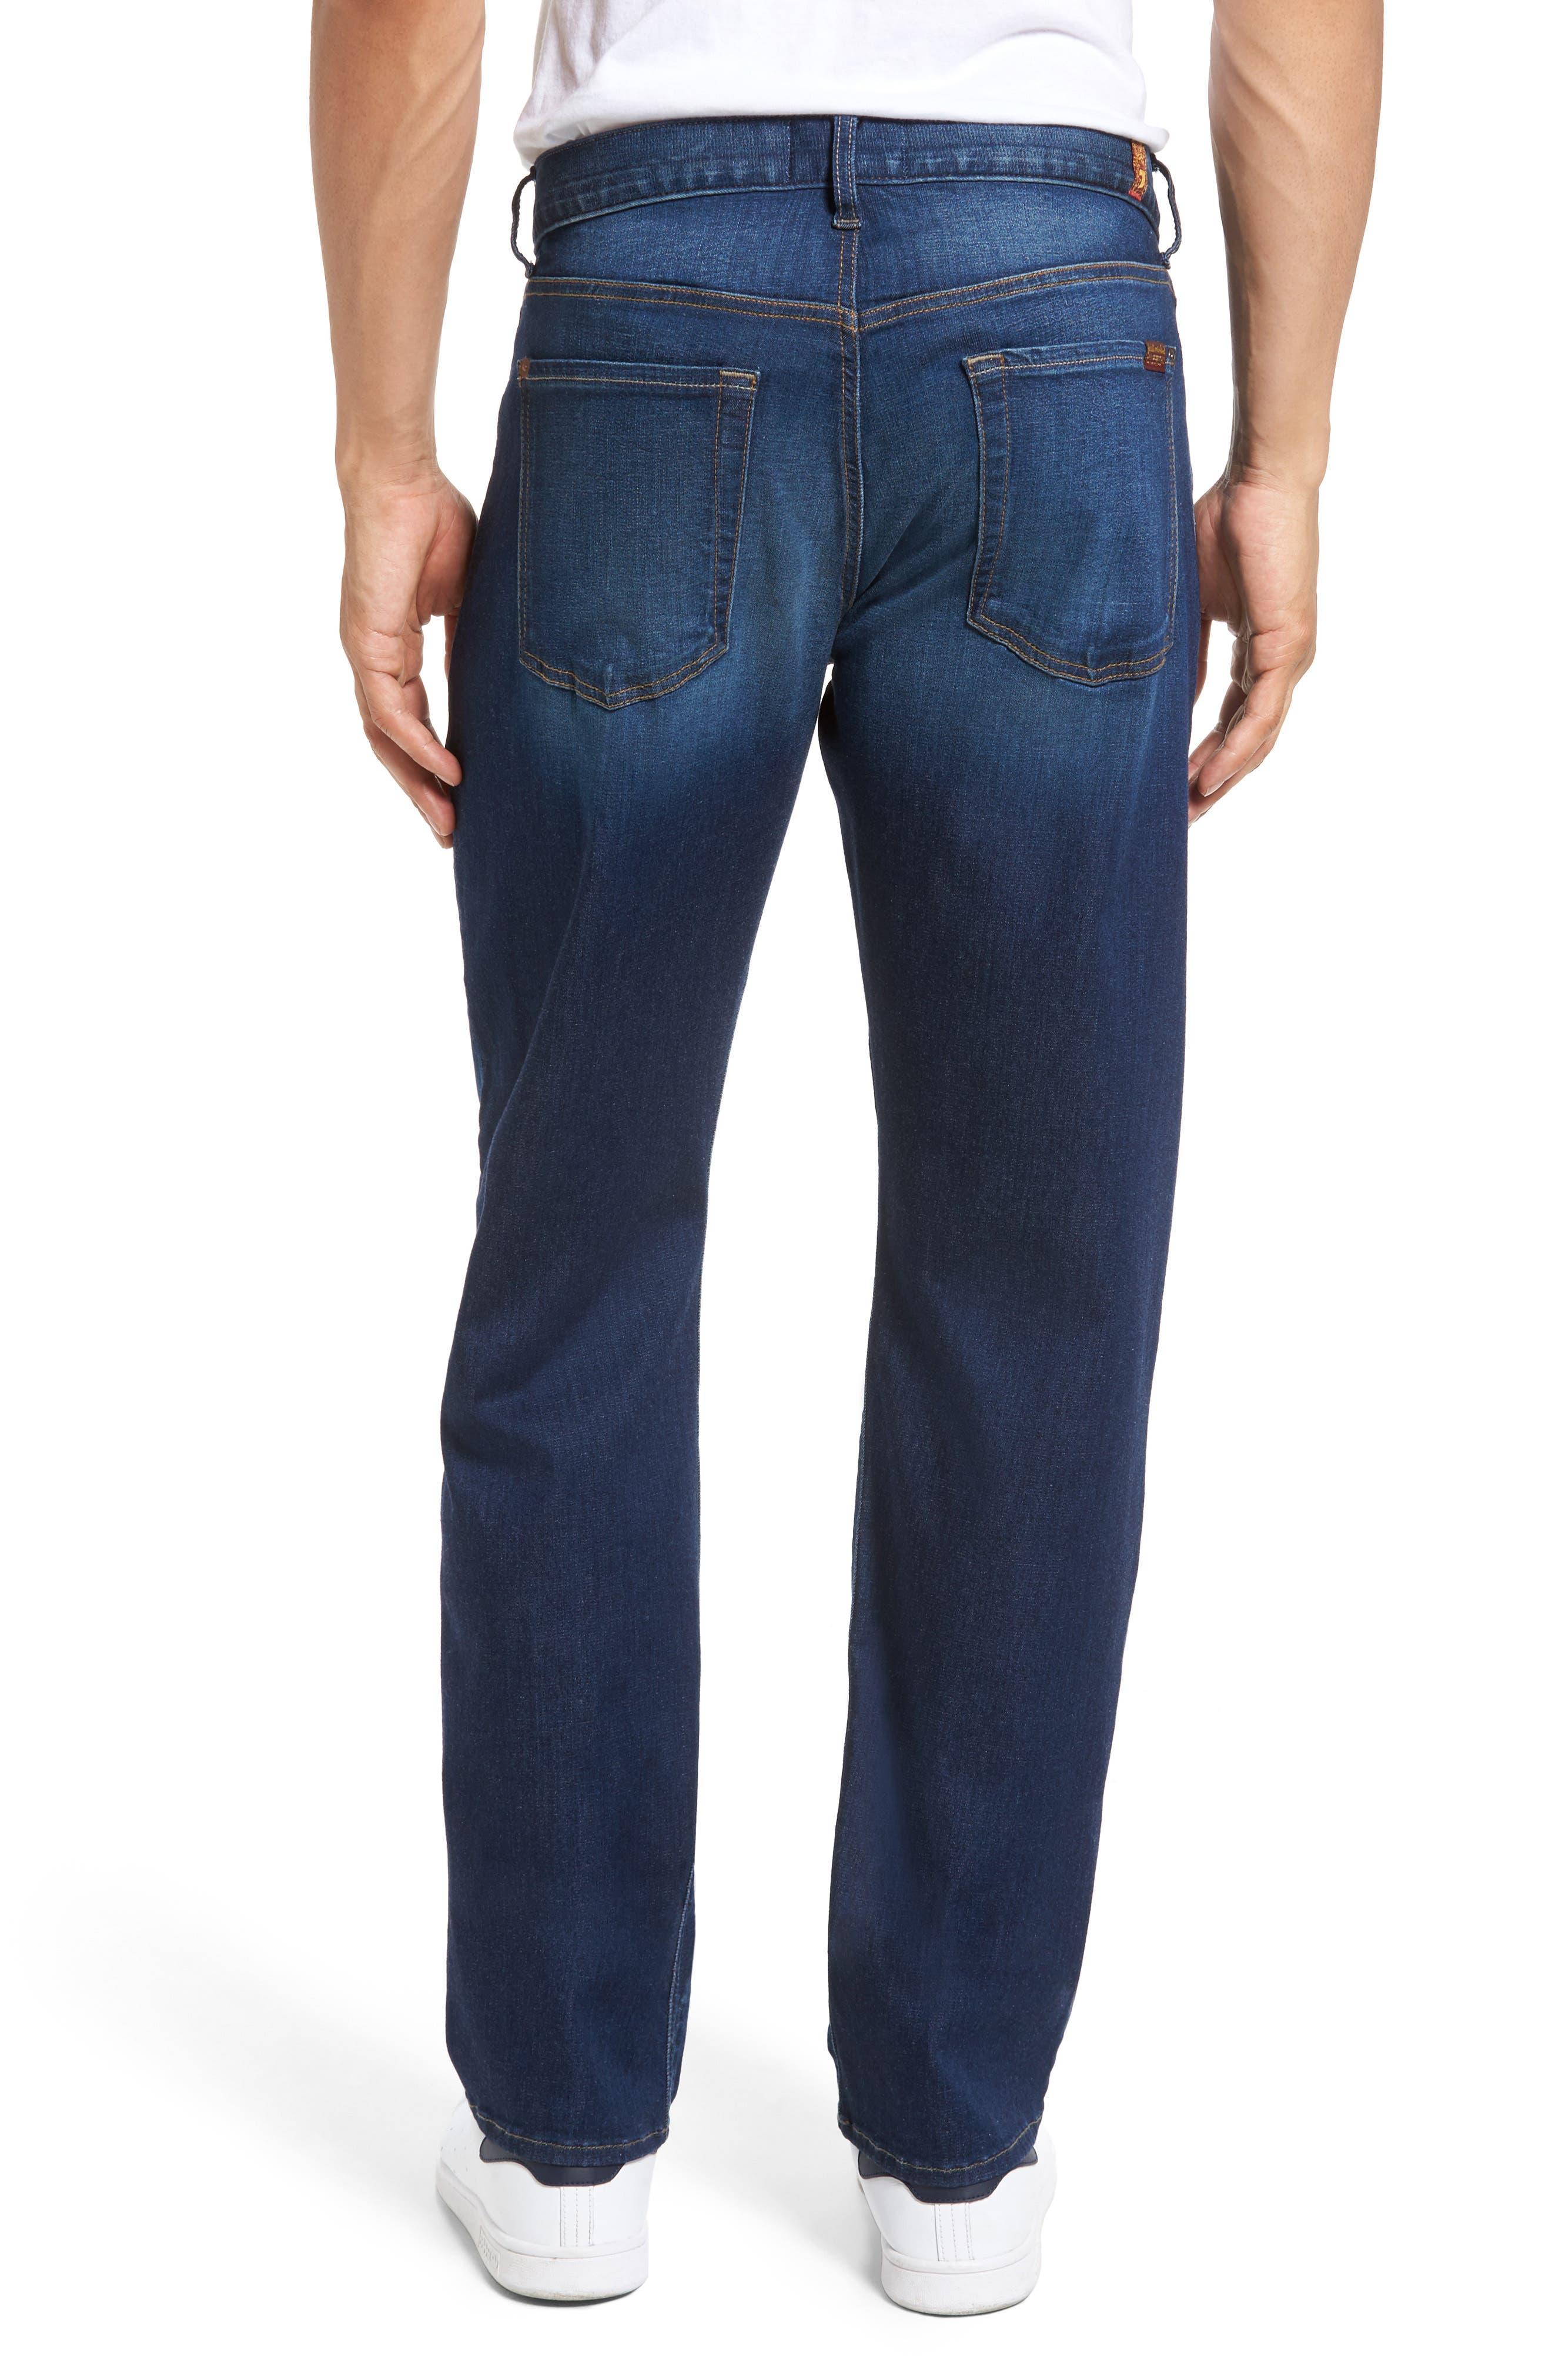 Alternate Image 2  - 7 For All Mankind® Slimmy Slim Fit Jeans (MOMT-Momentum)